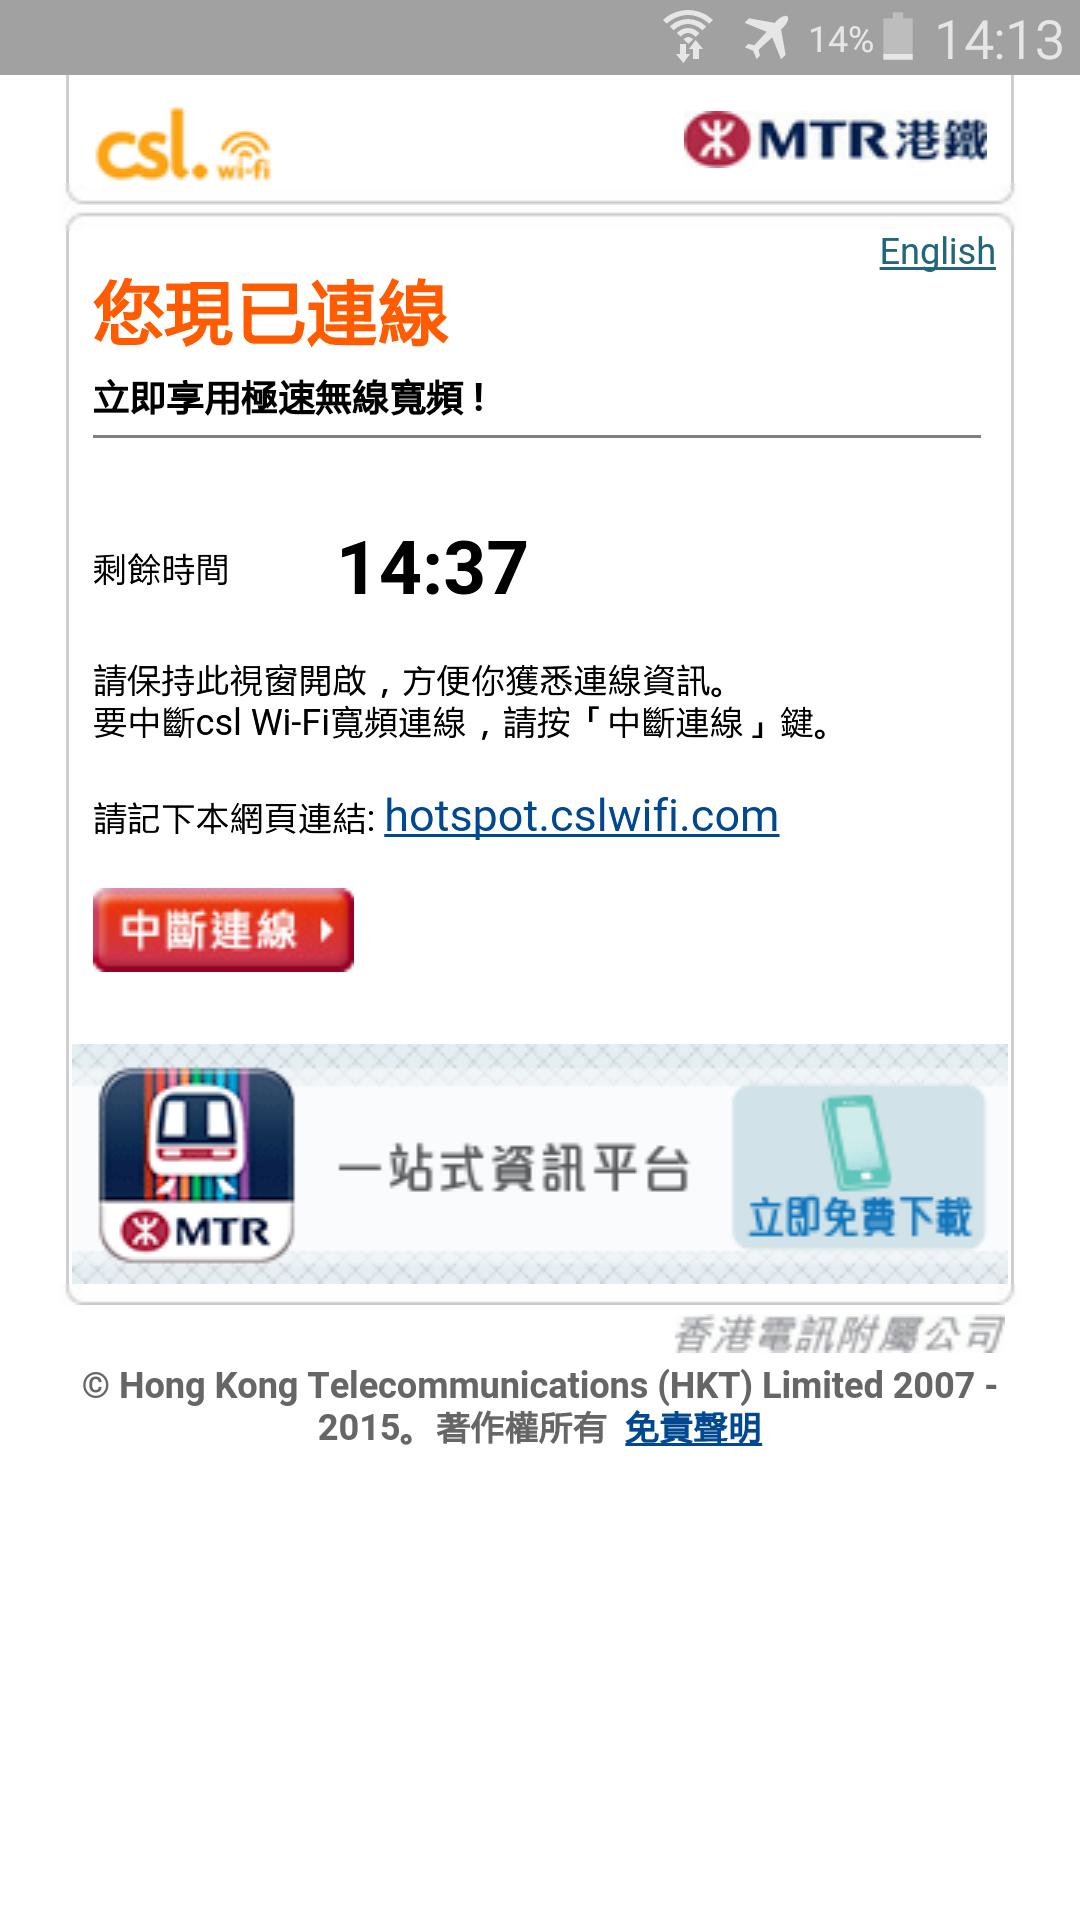 2015-12-19_九龍塘 MTR 06.png